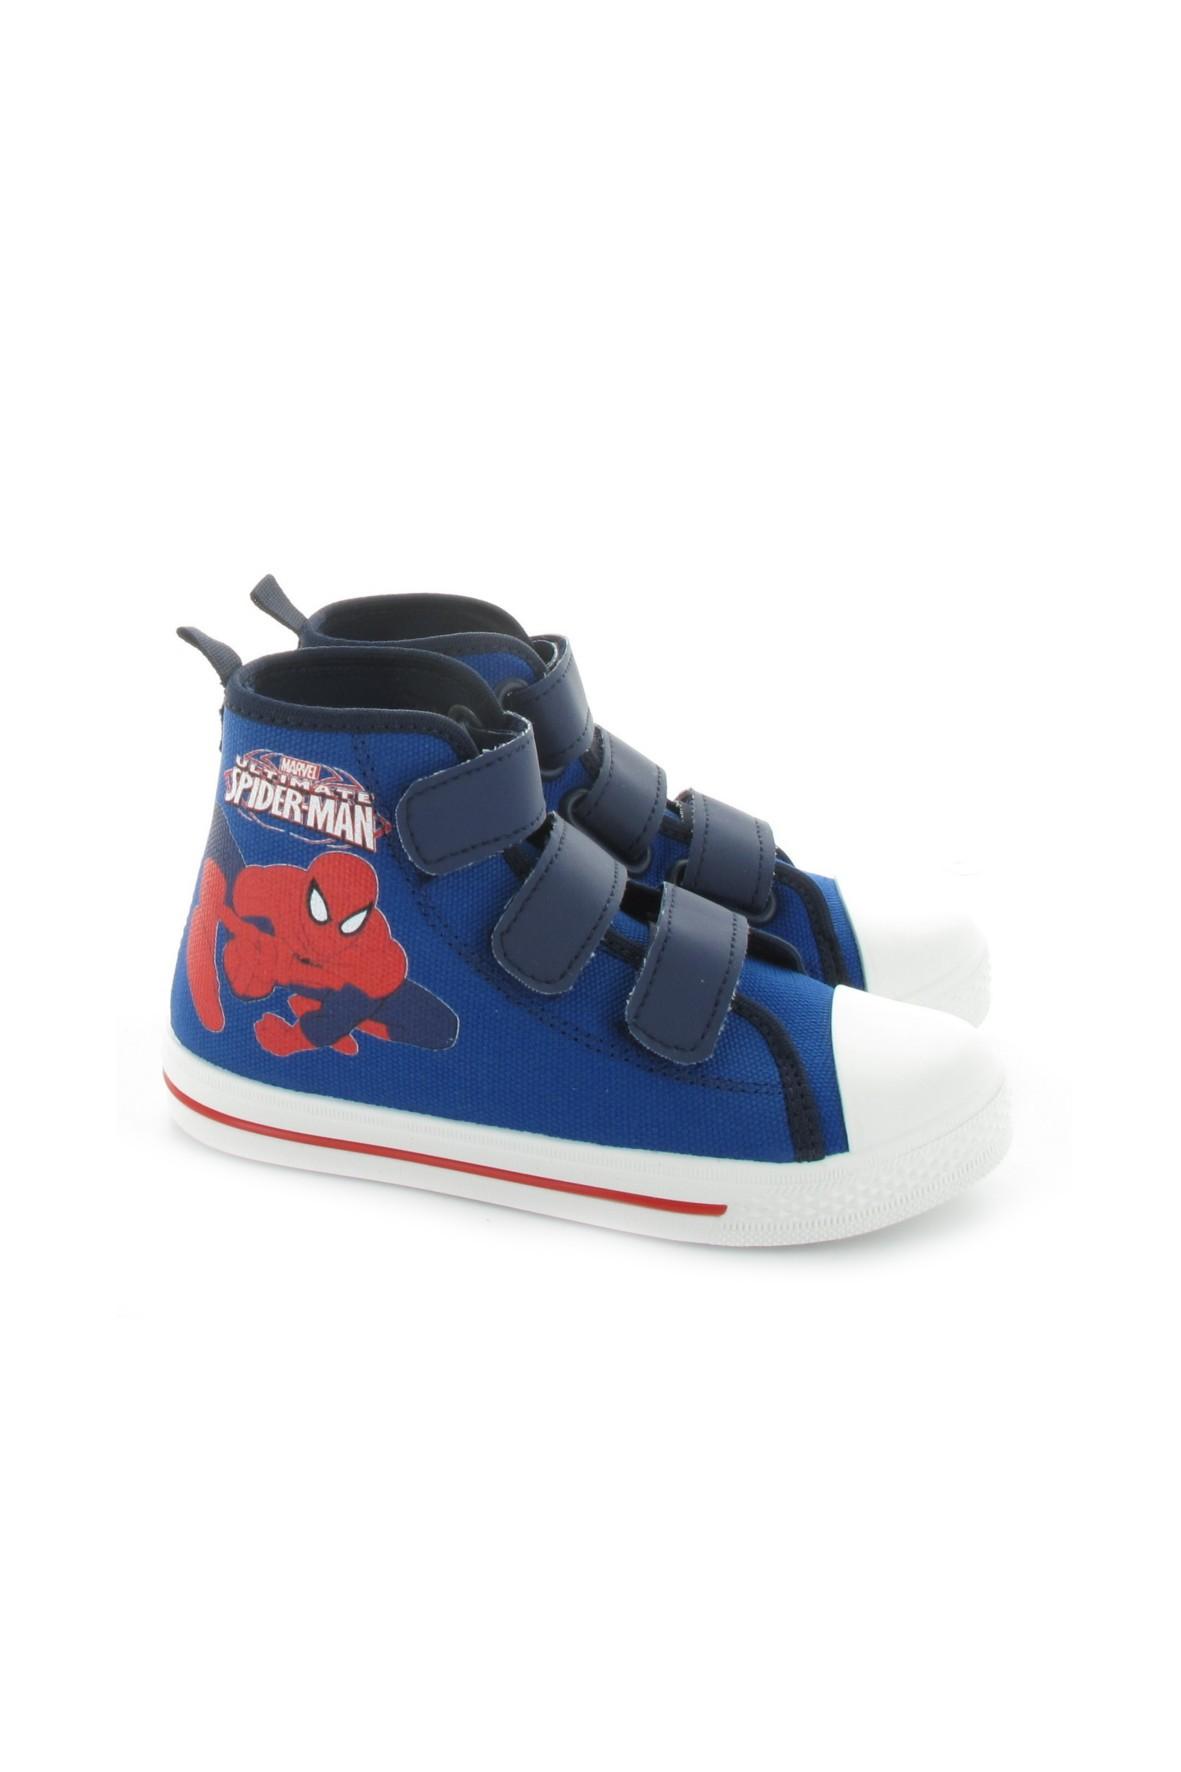 Trampki chłopięce Spiderman